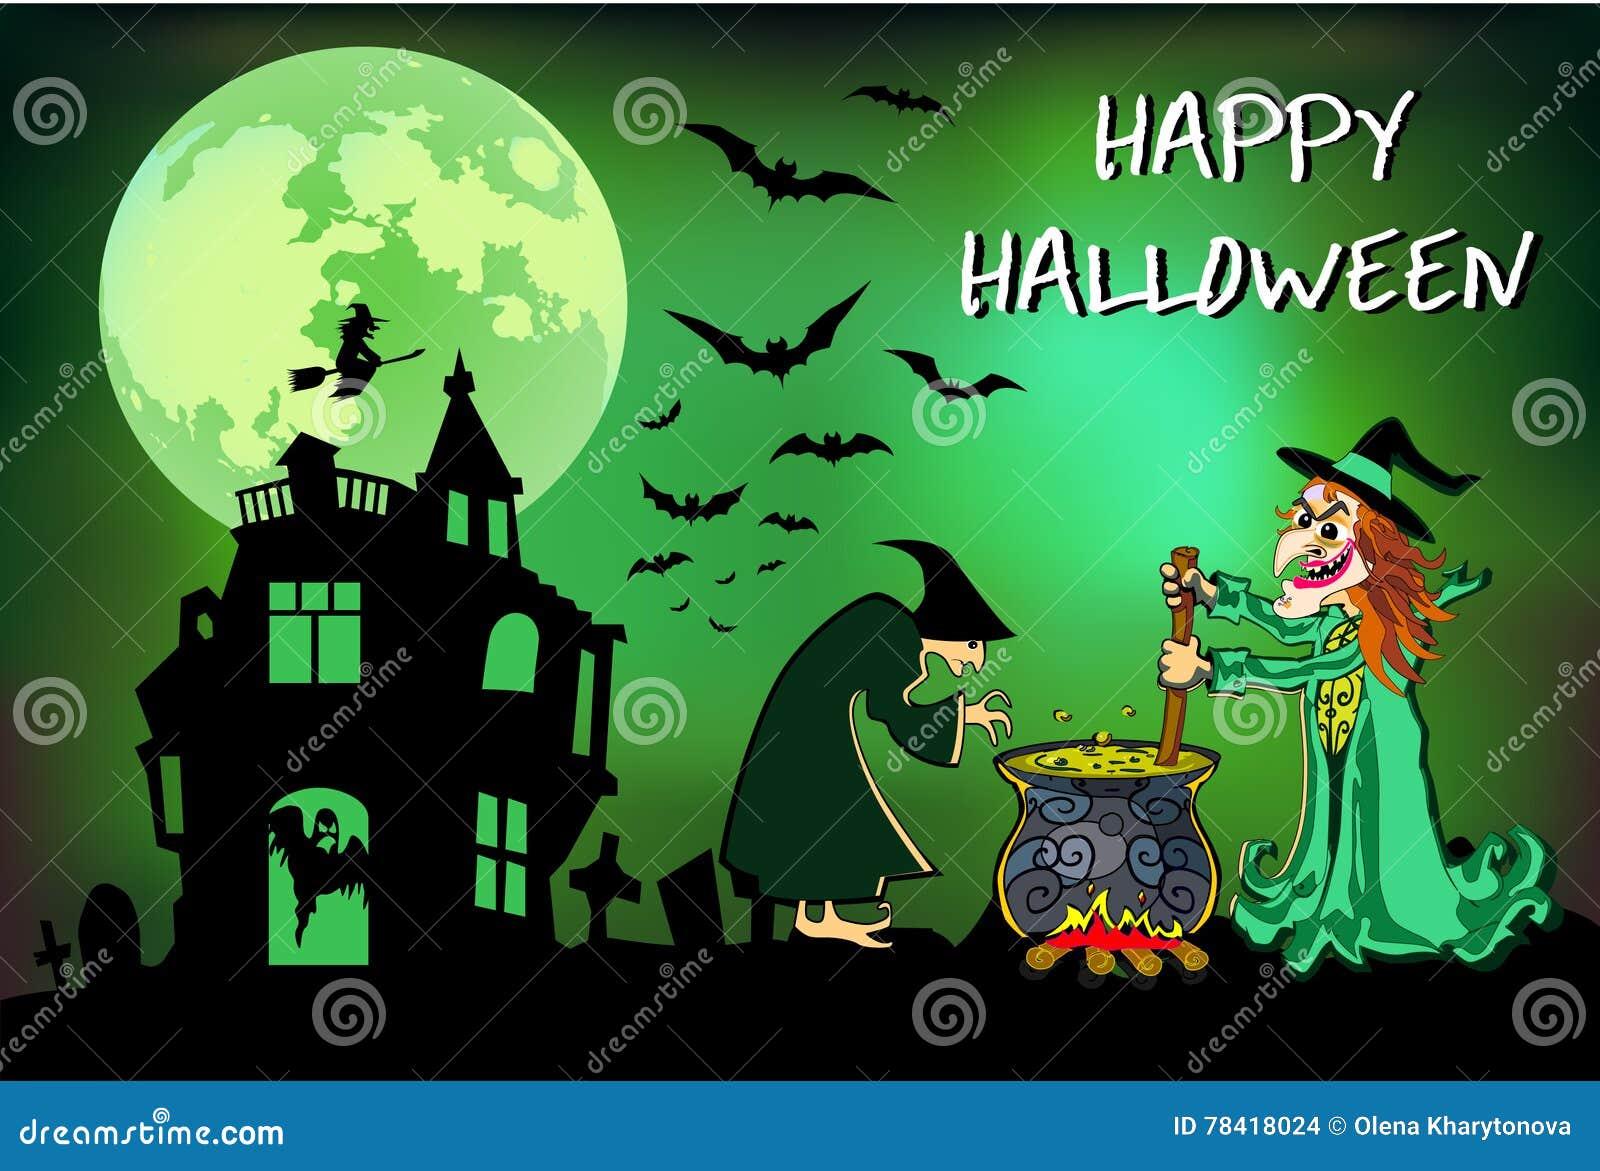 Halloween-Hexen Brauen Diesen Trank, Plakat, Bunte Illustration ...